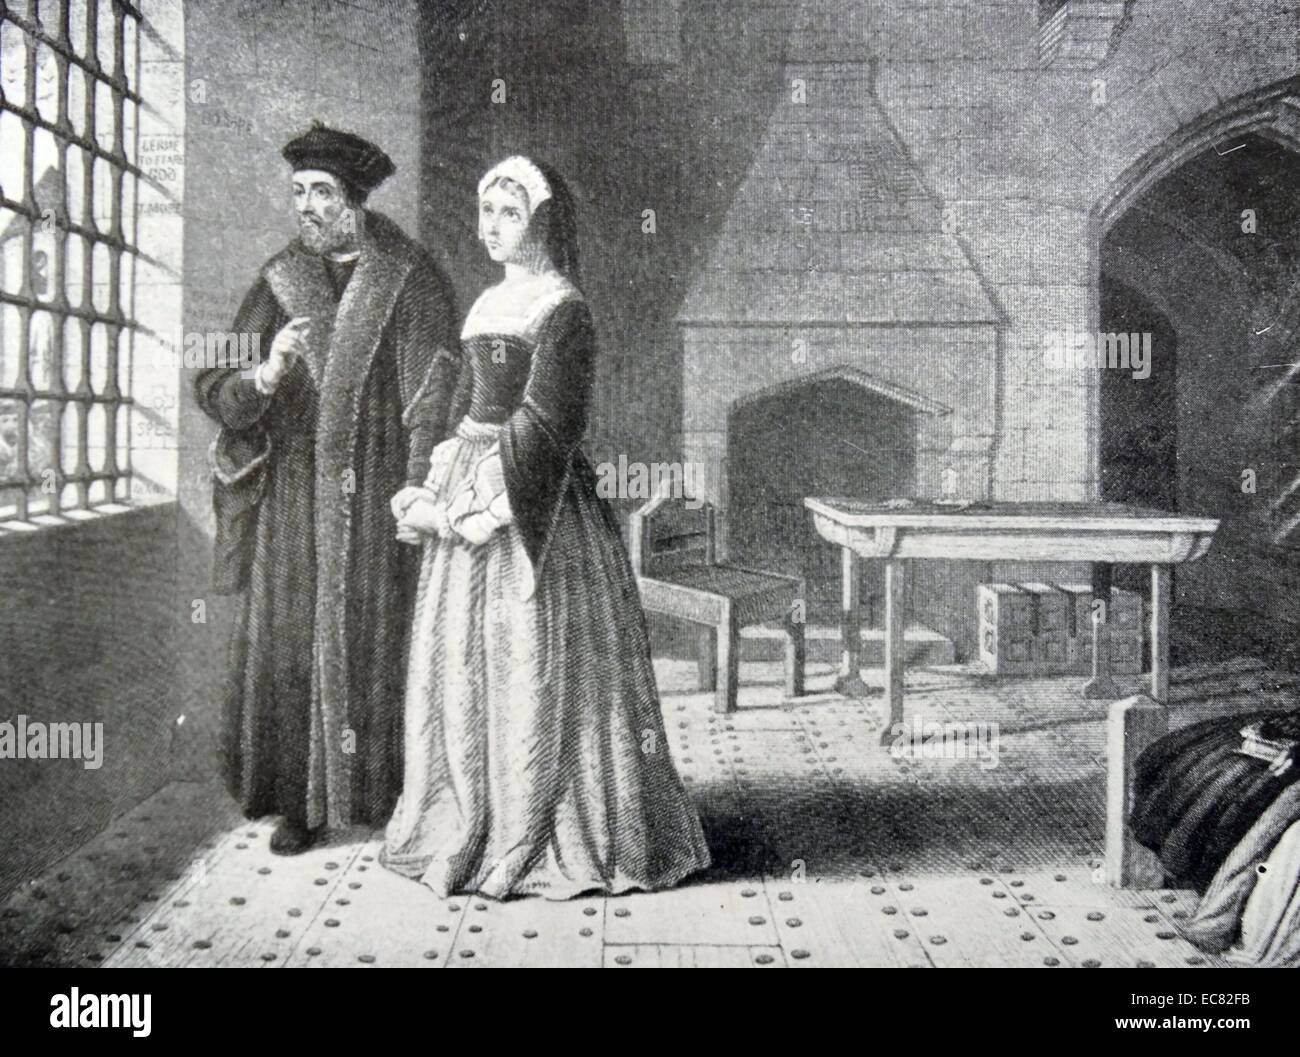 Engraving of Sir Thomas More and Daughter Margaret - Stock Image